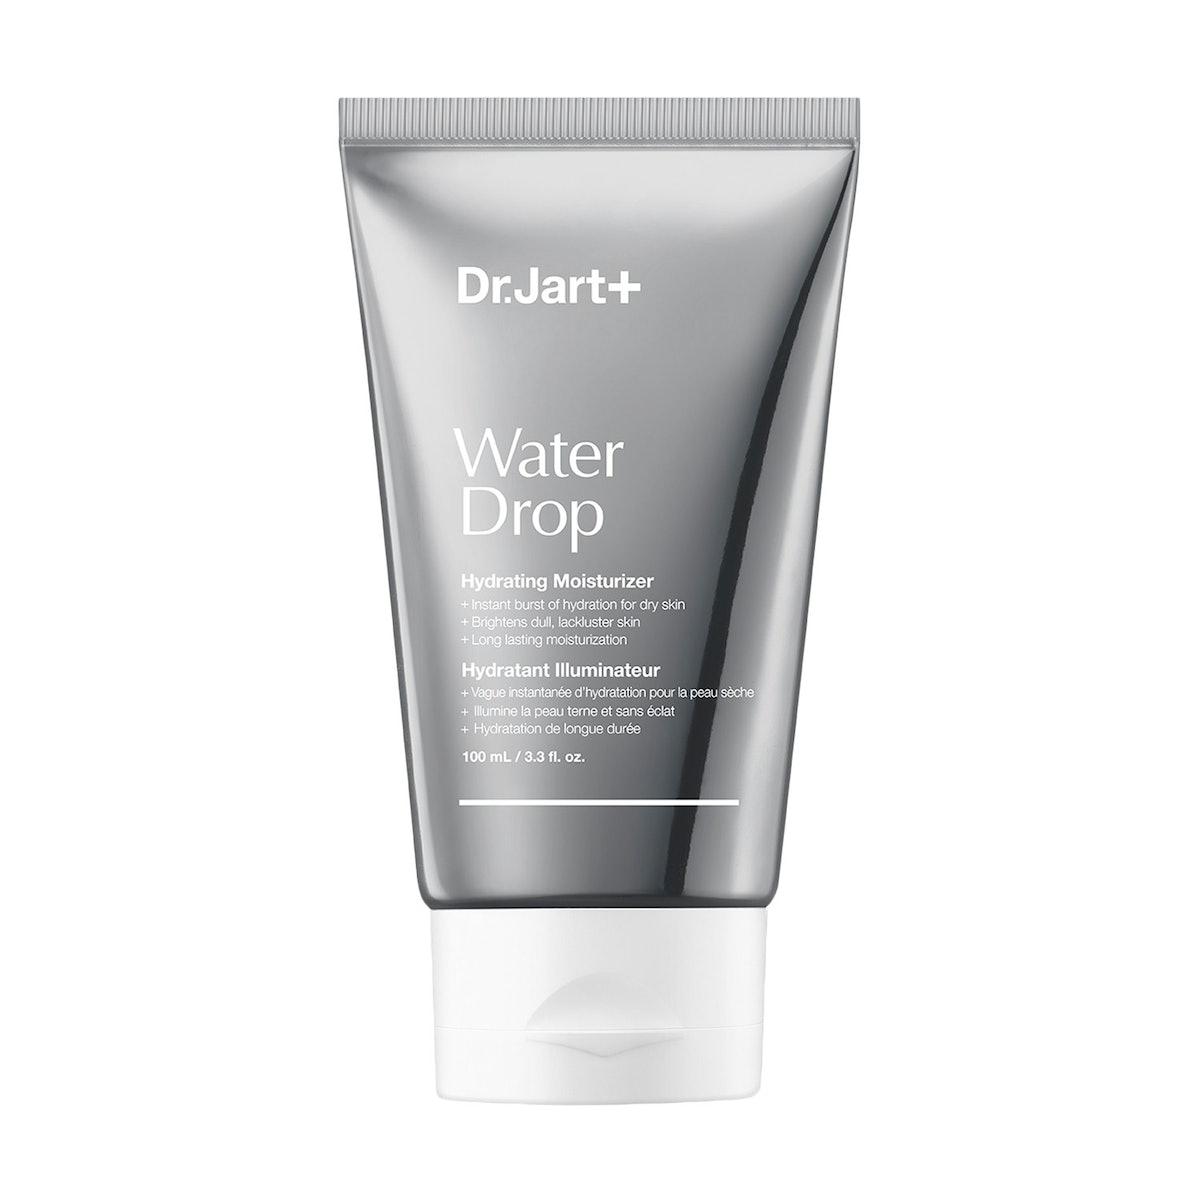 Dr. Jart+ Water Drop Hydrating Moisturizer (3.3 oz)